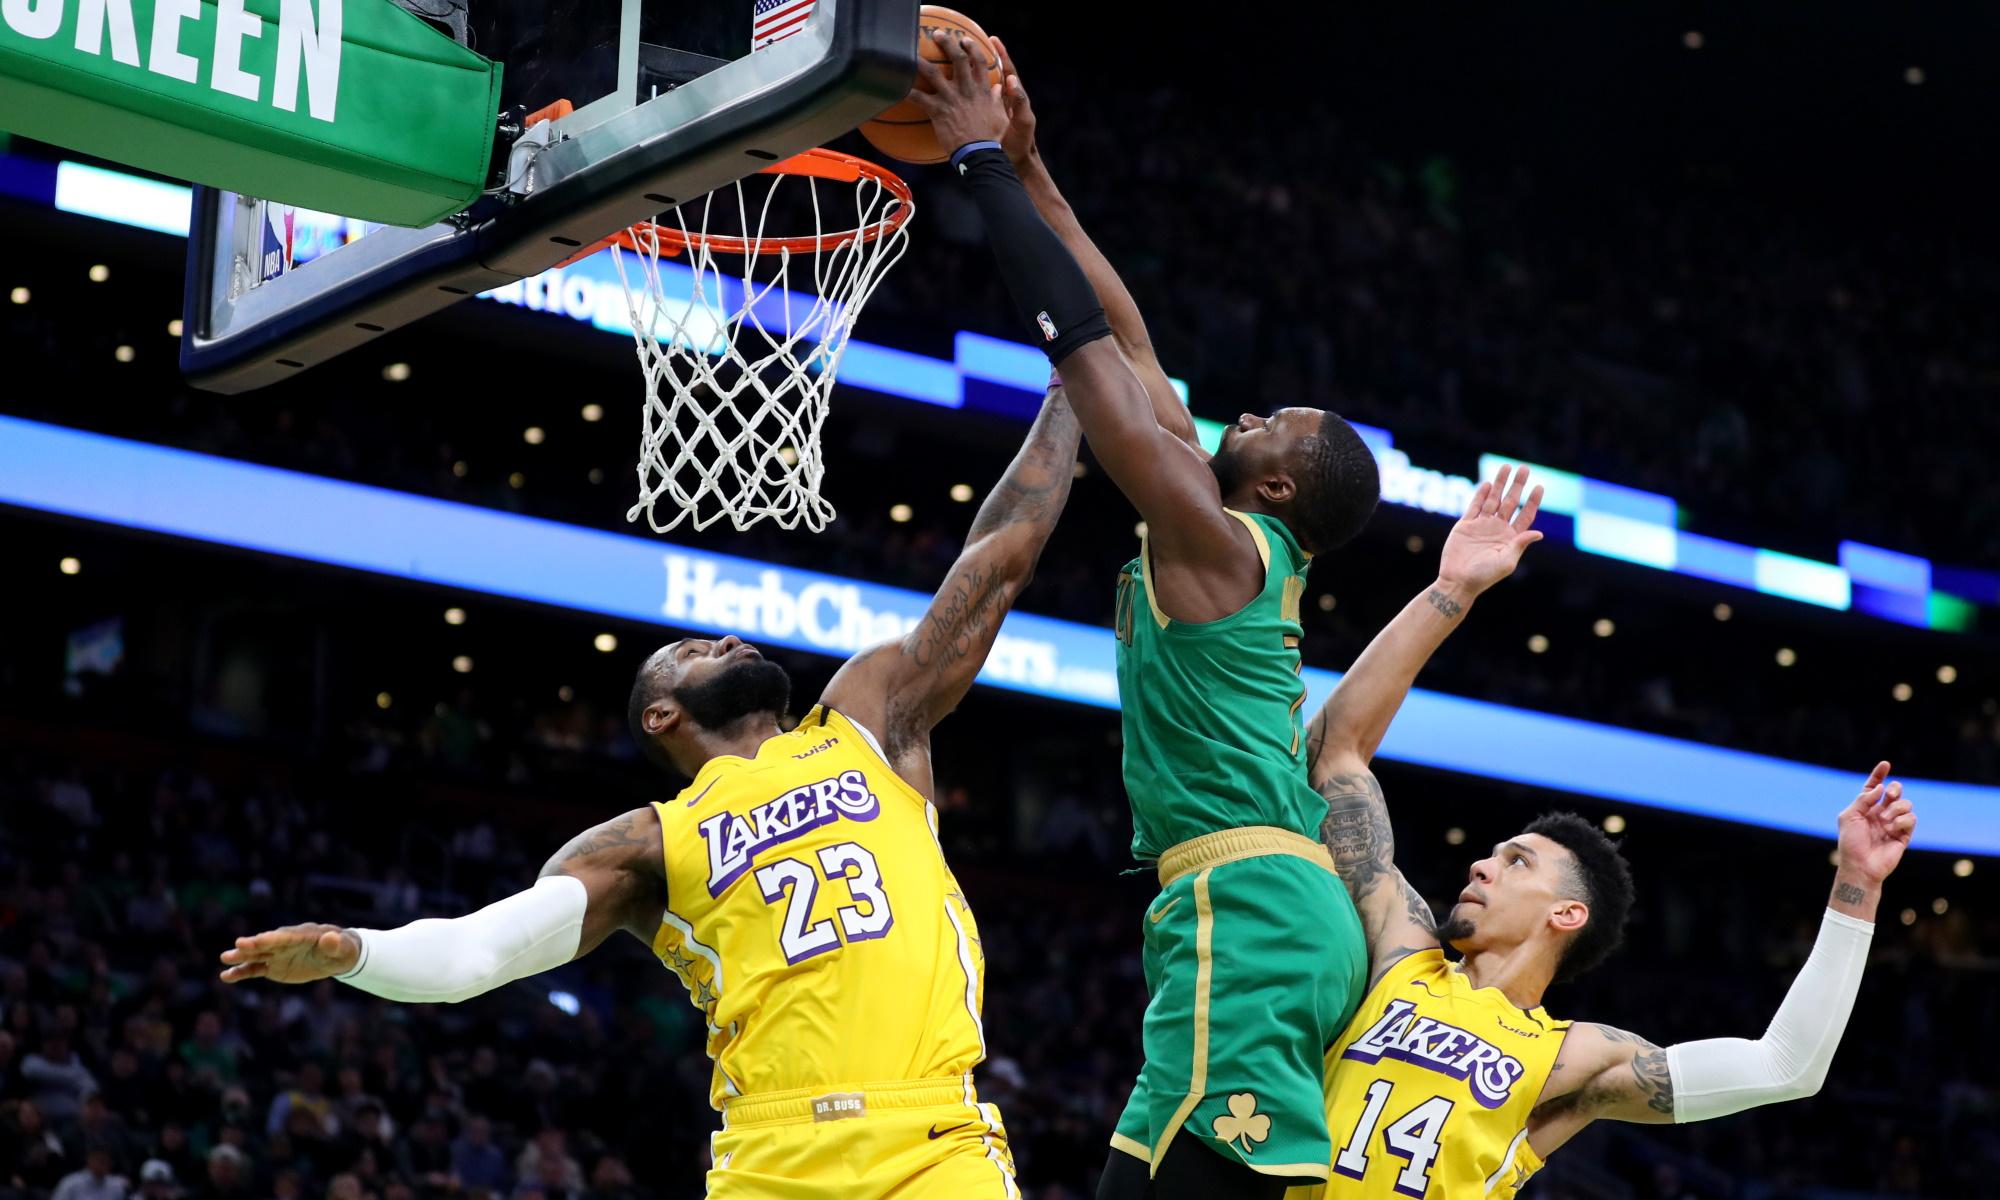 LeBron James, Jaylen Brown and Danny Green. Los Angeles Lakers vs Boston Celtics at TD Garden